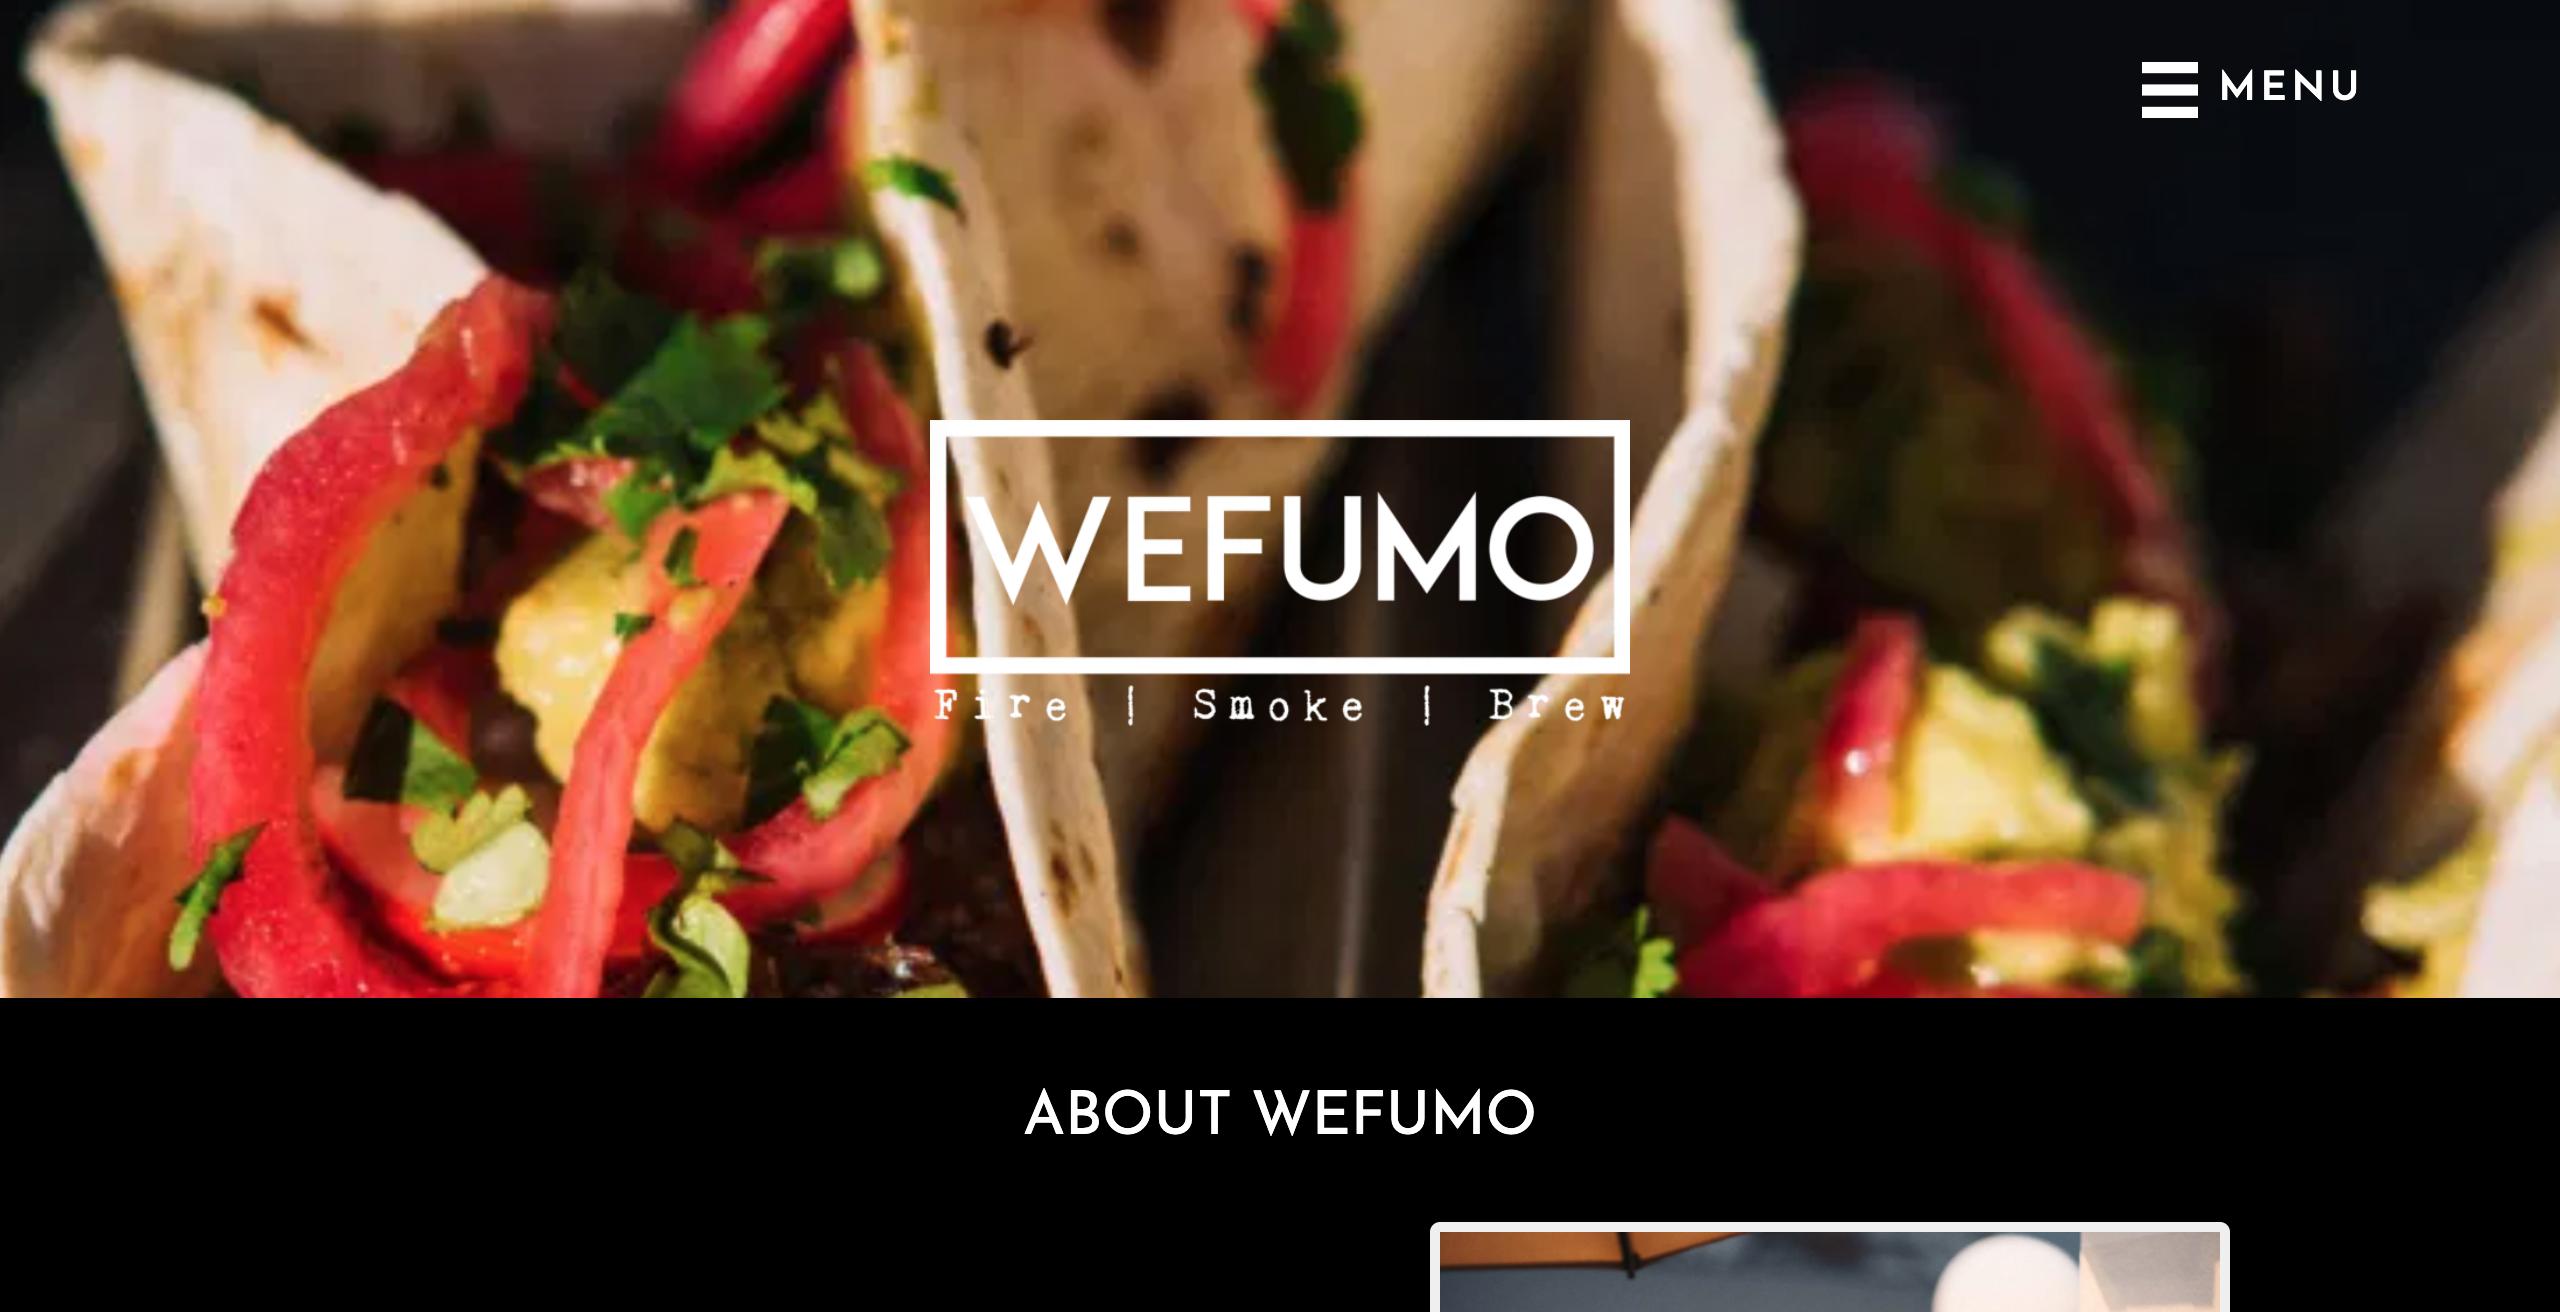 Wefumo website screenshot